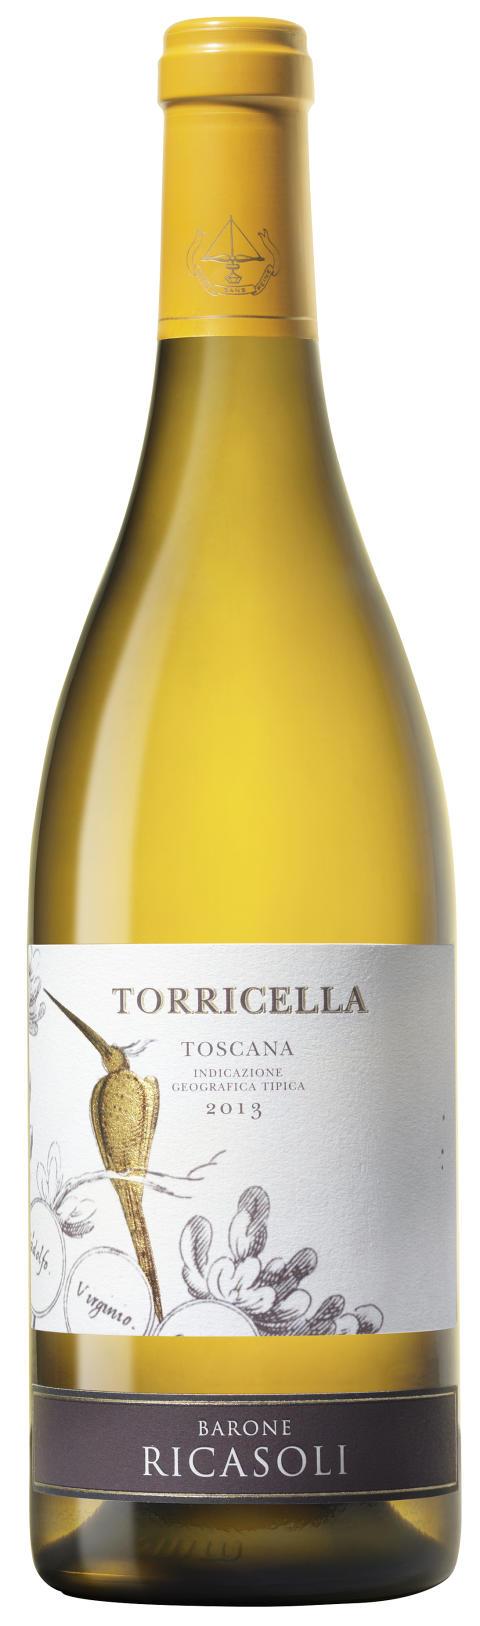 Torricella - ny design